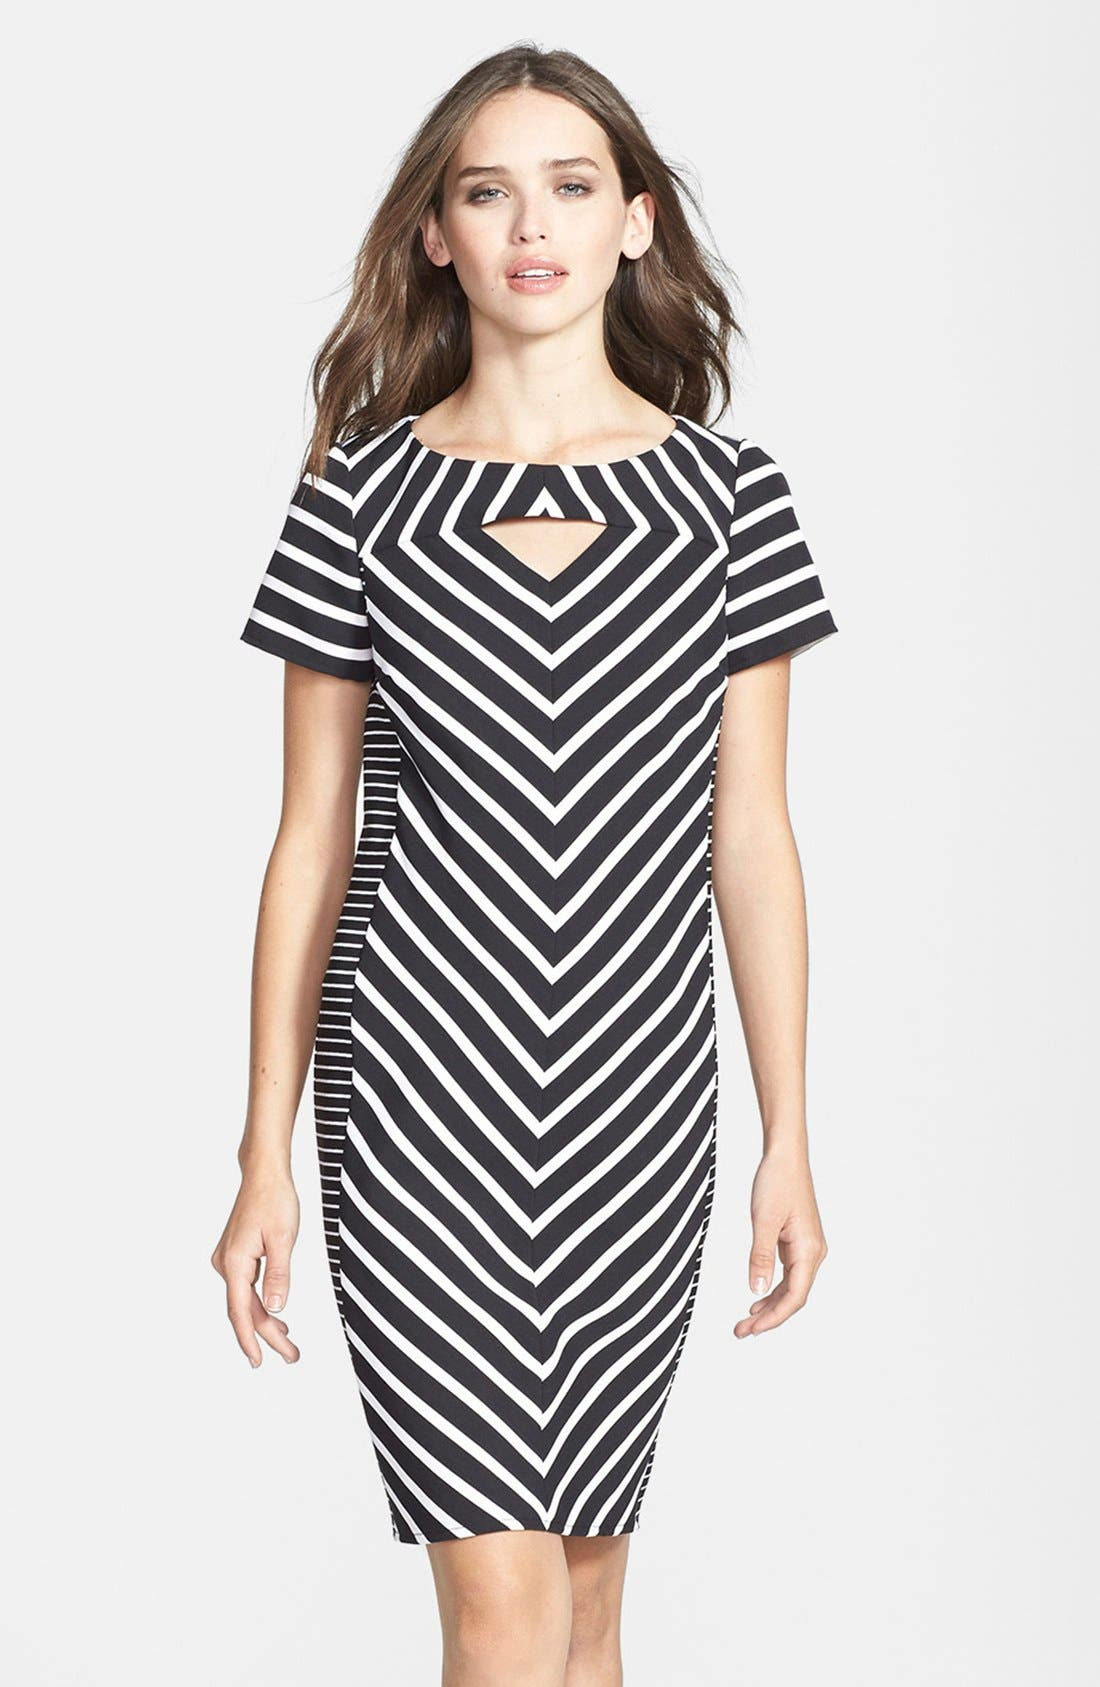 Alternate Image 1 Selected - Gabby Skye Belted Burnout Organza Fit & Flare Dress